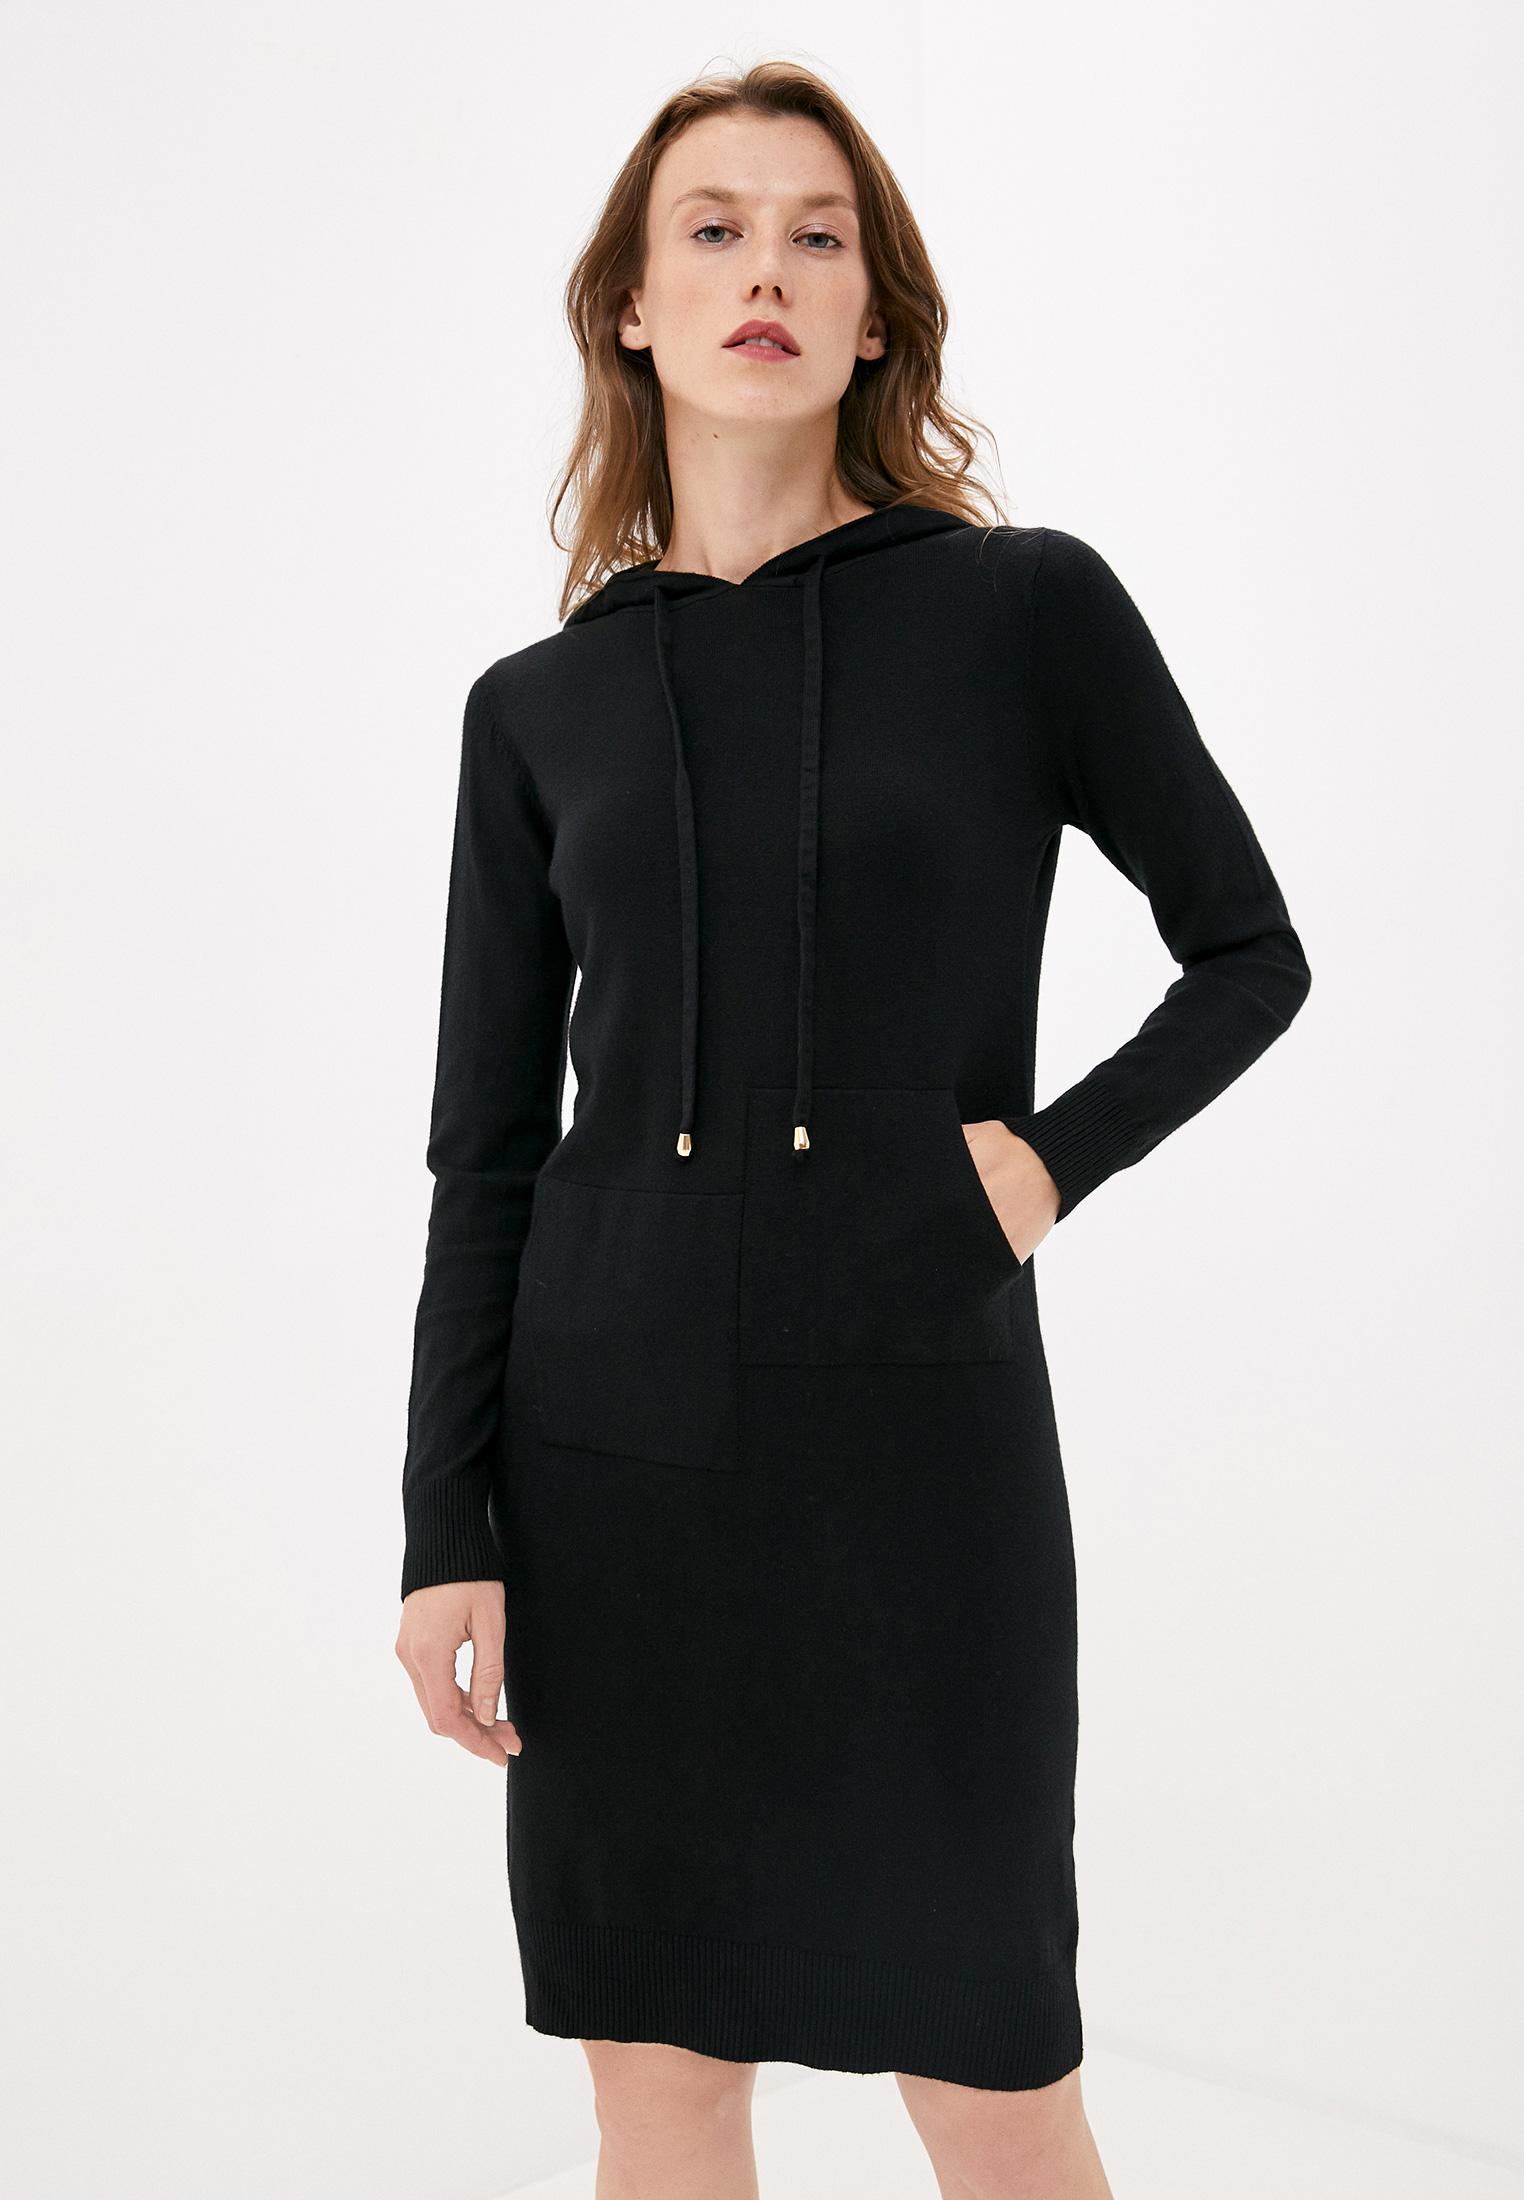 Вязаное платье Nerouge N990-3